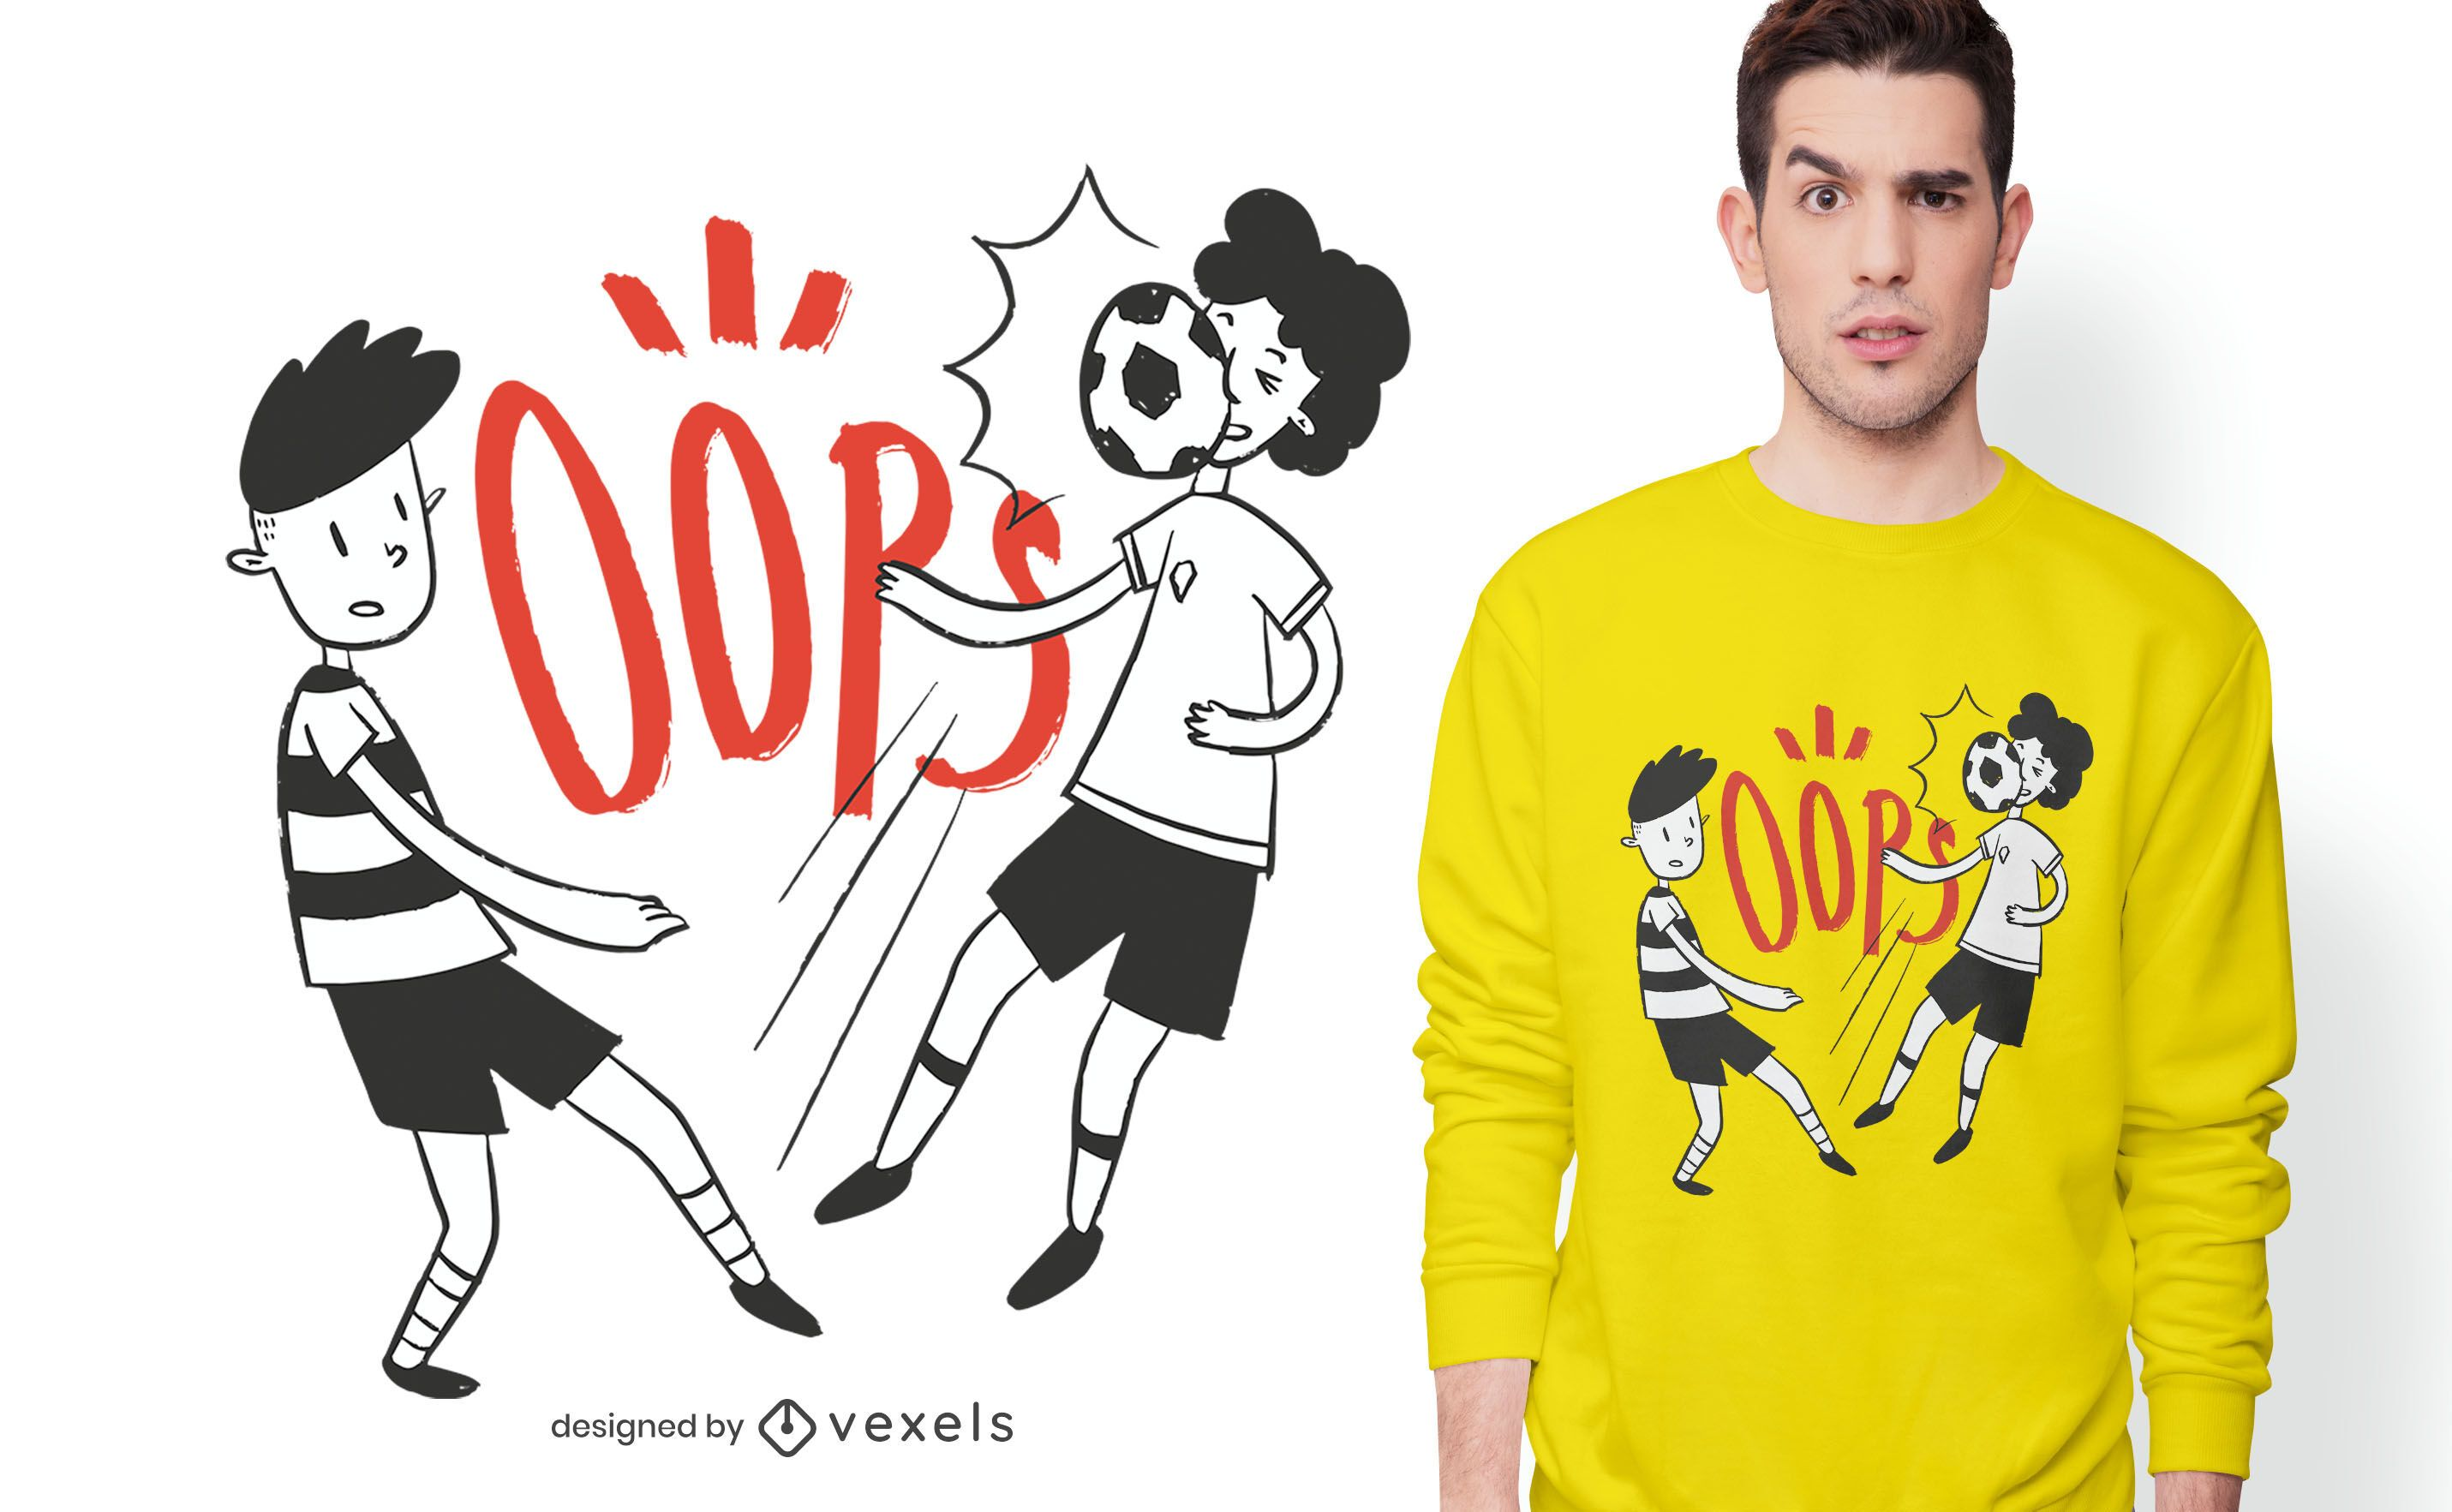 oops soccer t-shirt design